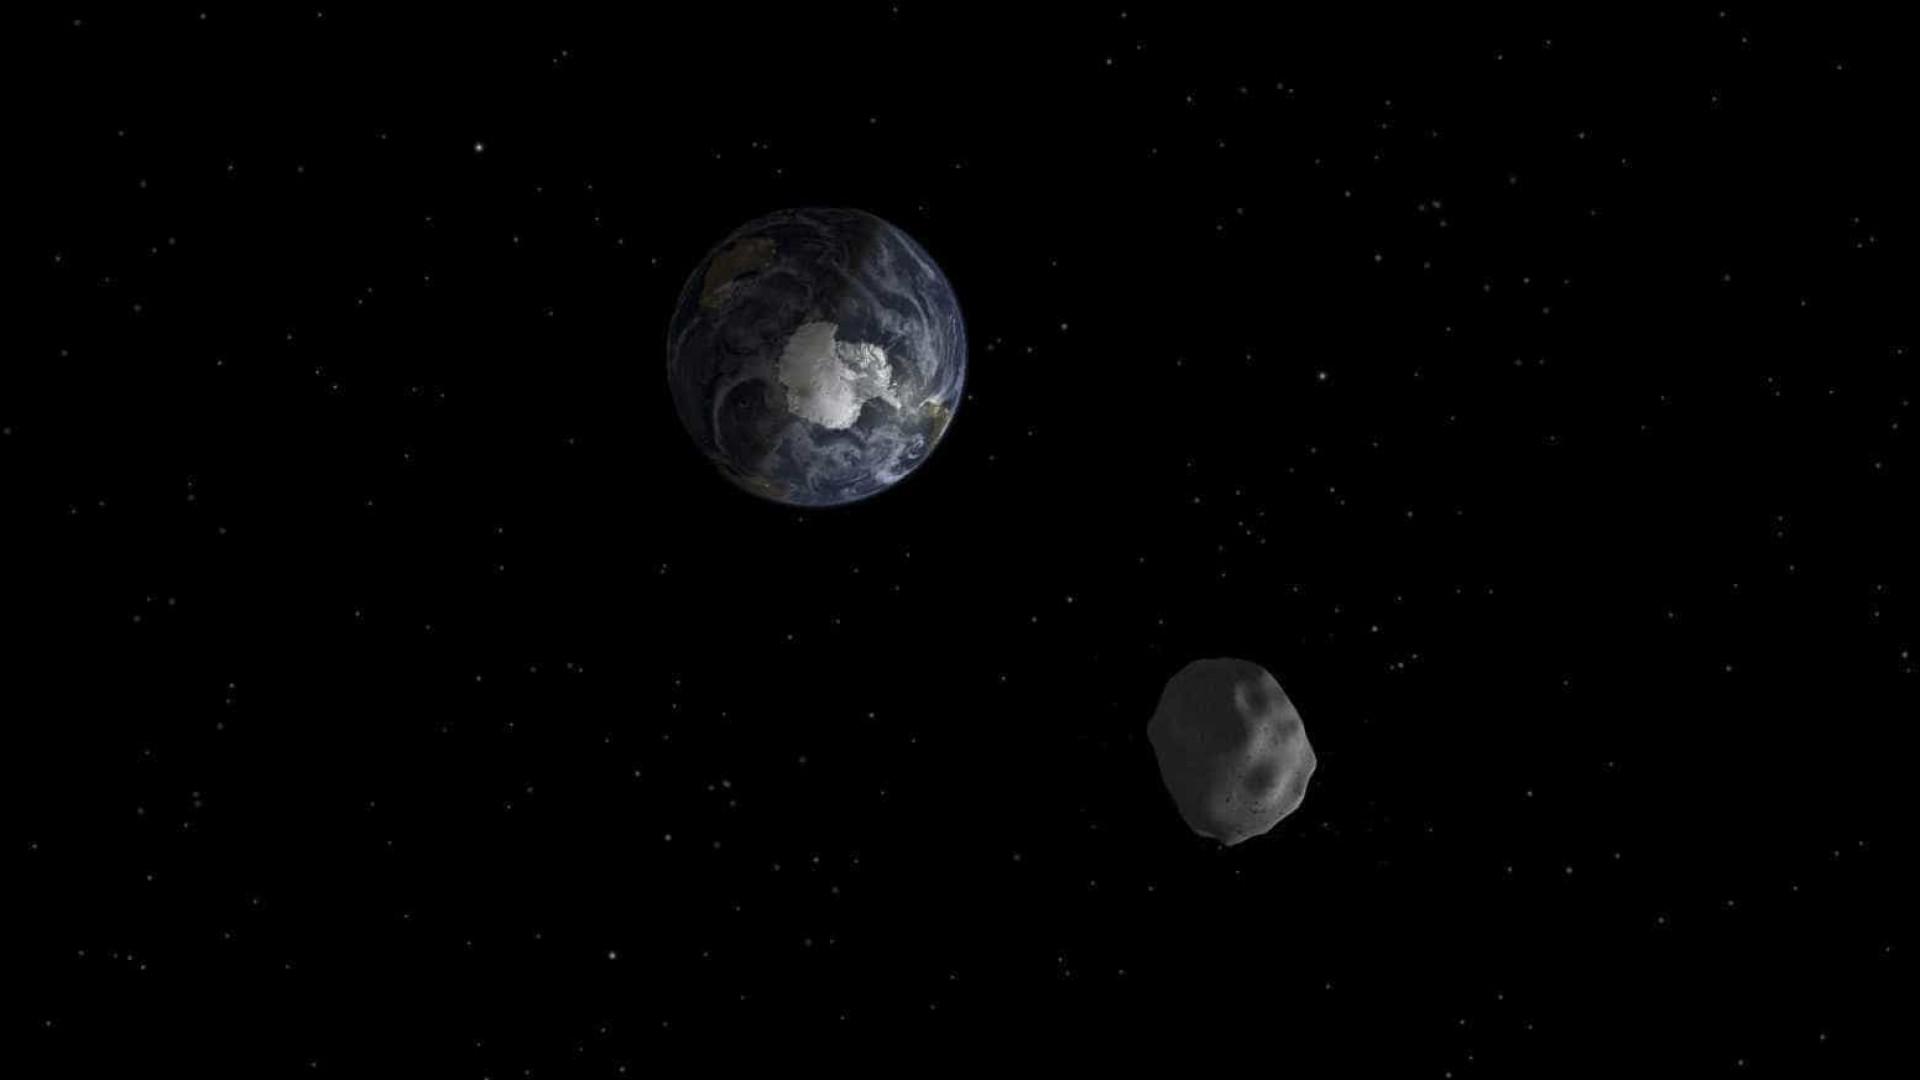 Asteroide gigante passa 'raspando' pela Terra neste sábado